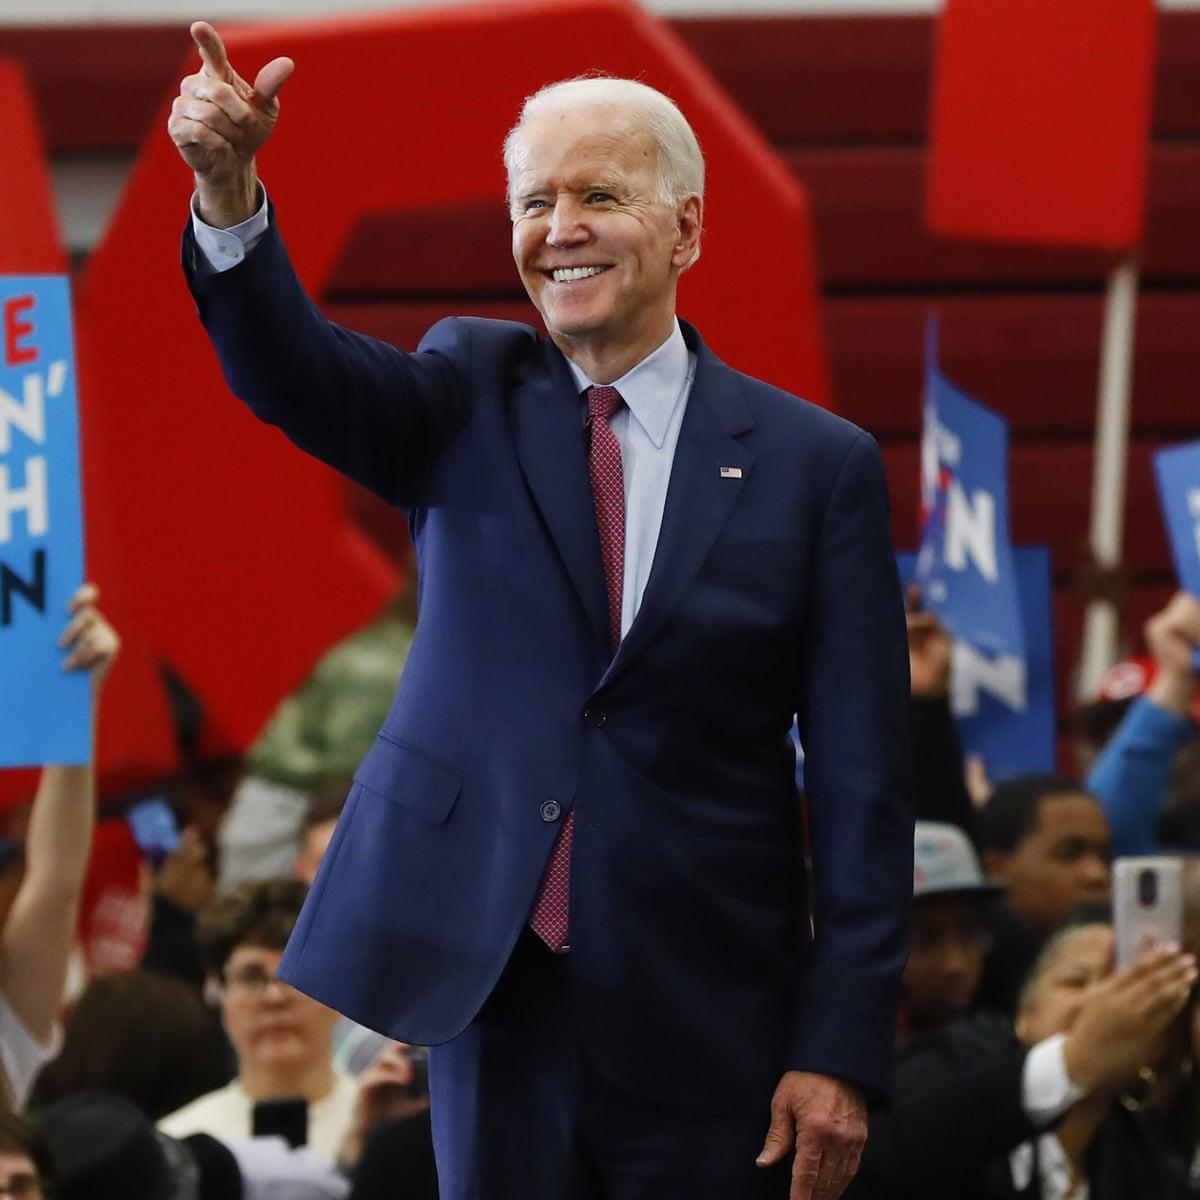 Joe Biden Positions Himself As Bridge To Next Generation At Michigan Rally Joe Biden The Guardian